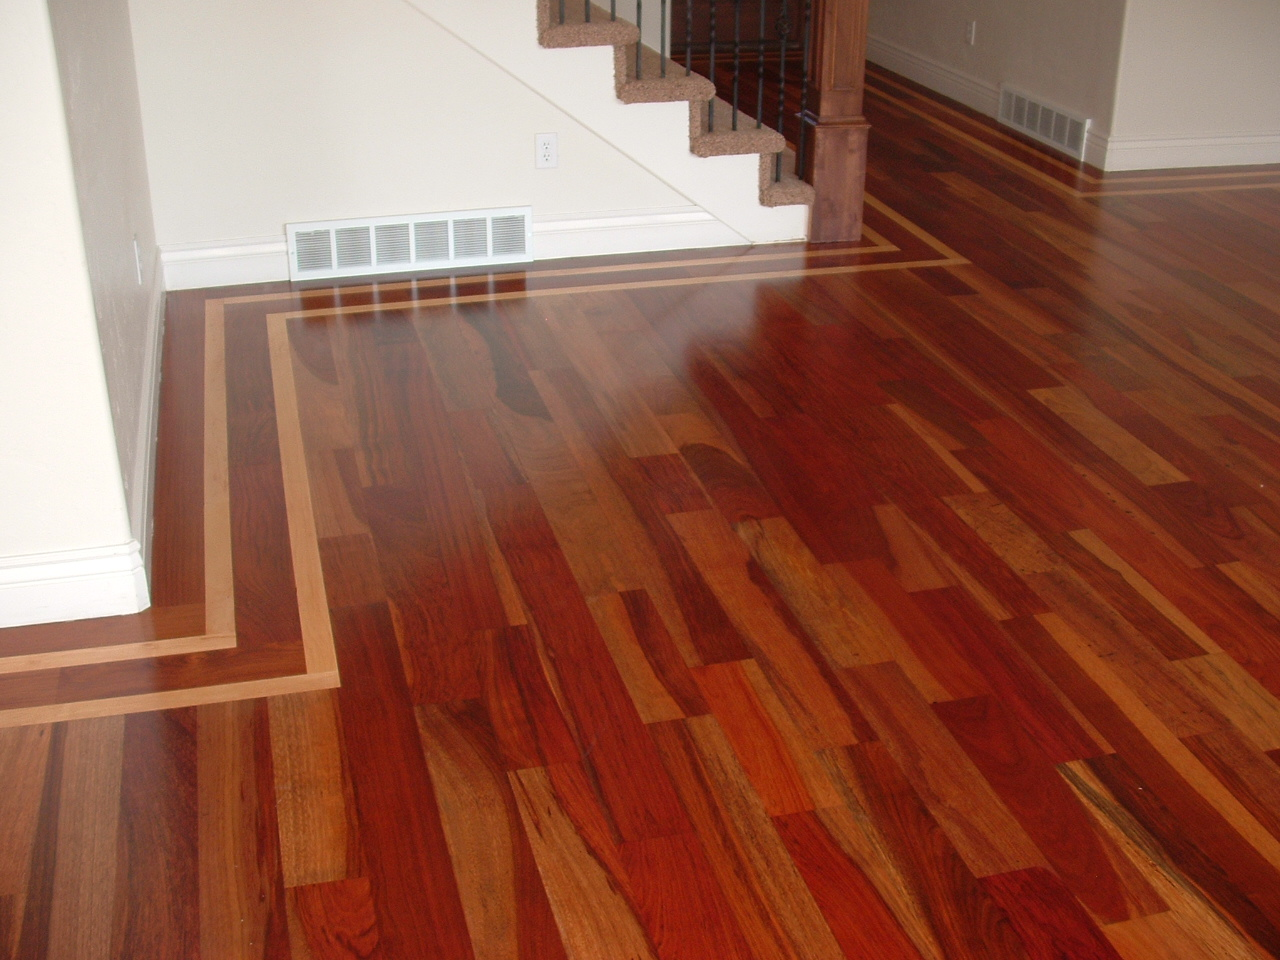 brazilian cherry hardwood flooring dark brazilian cherry hardwood floors room RKPOVQQ